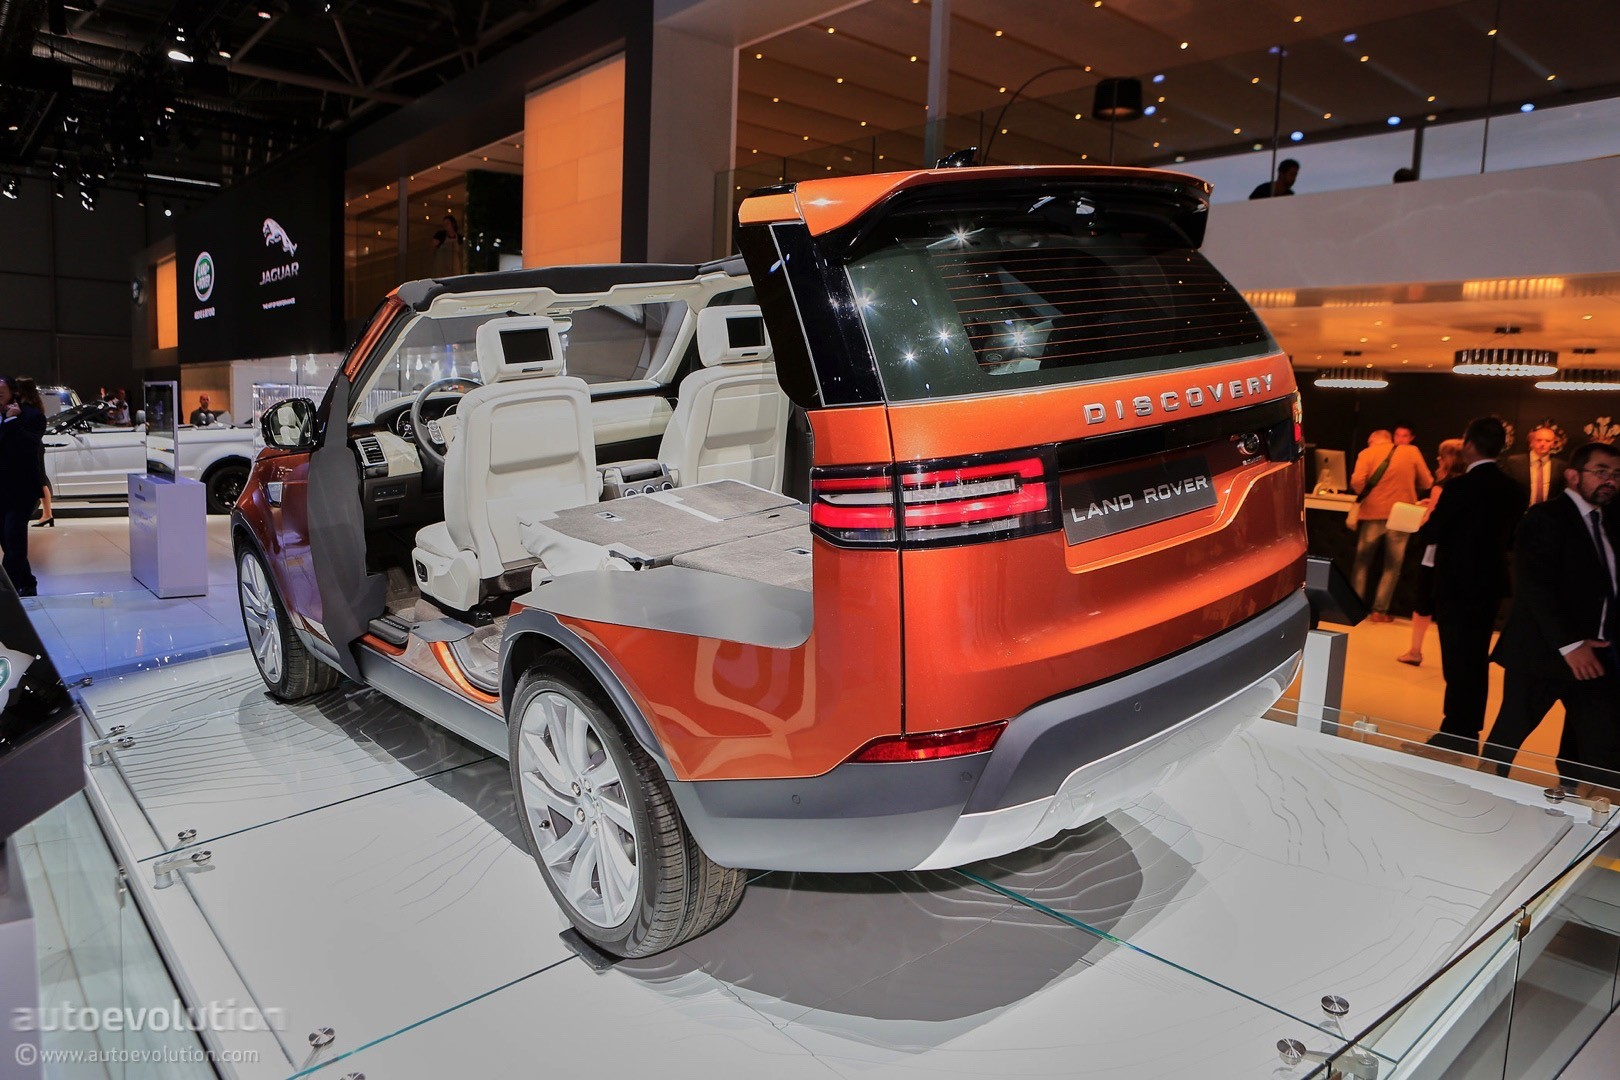 Land Rover Offers Harman Kardon Logic 7 Hd Sound System Autoevolution Range Wiring Diagram 2017 Discovery 5 Live At 2016 Paris Motor Show